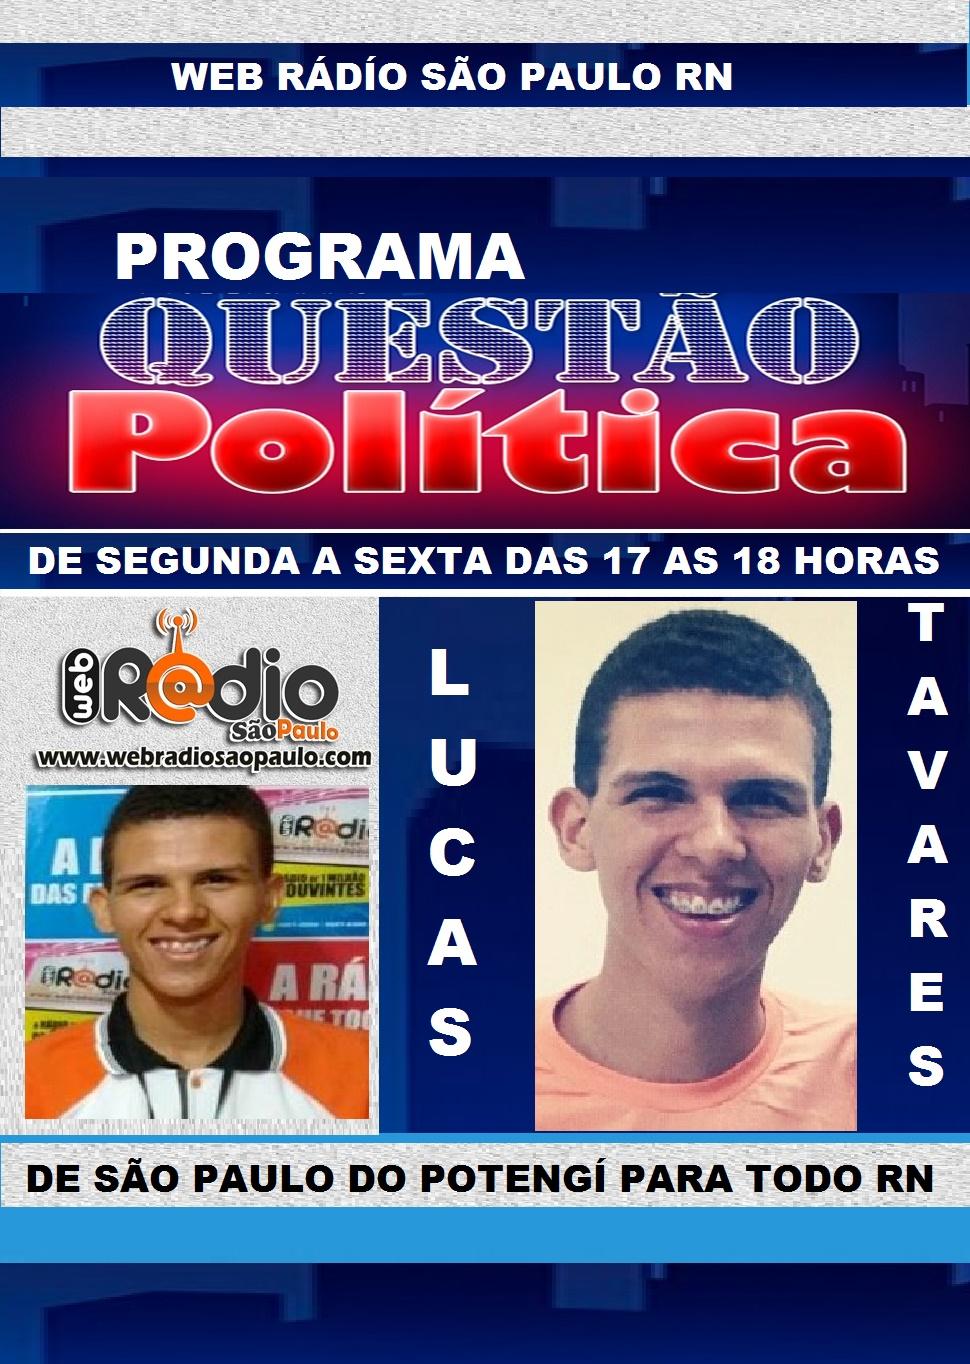 PROGRAMA QUESTÃO POLÍTICA WEB RÁDÍO SÃO PAULO